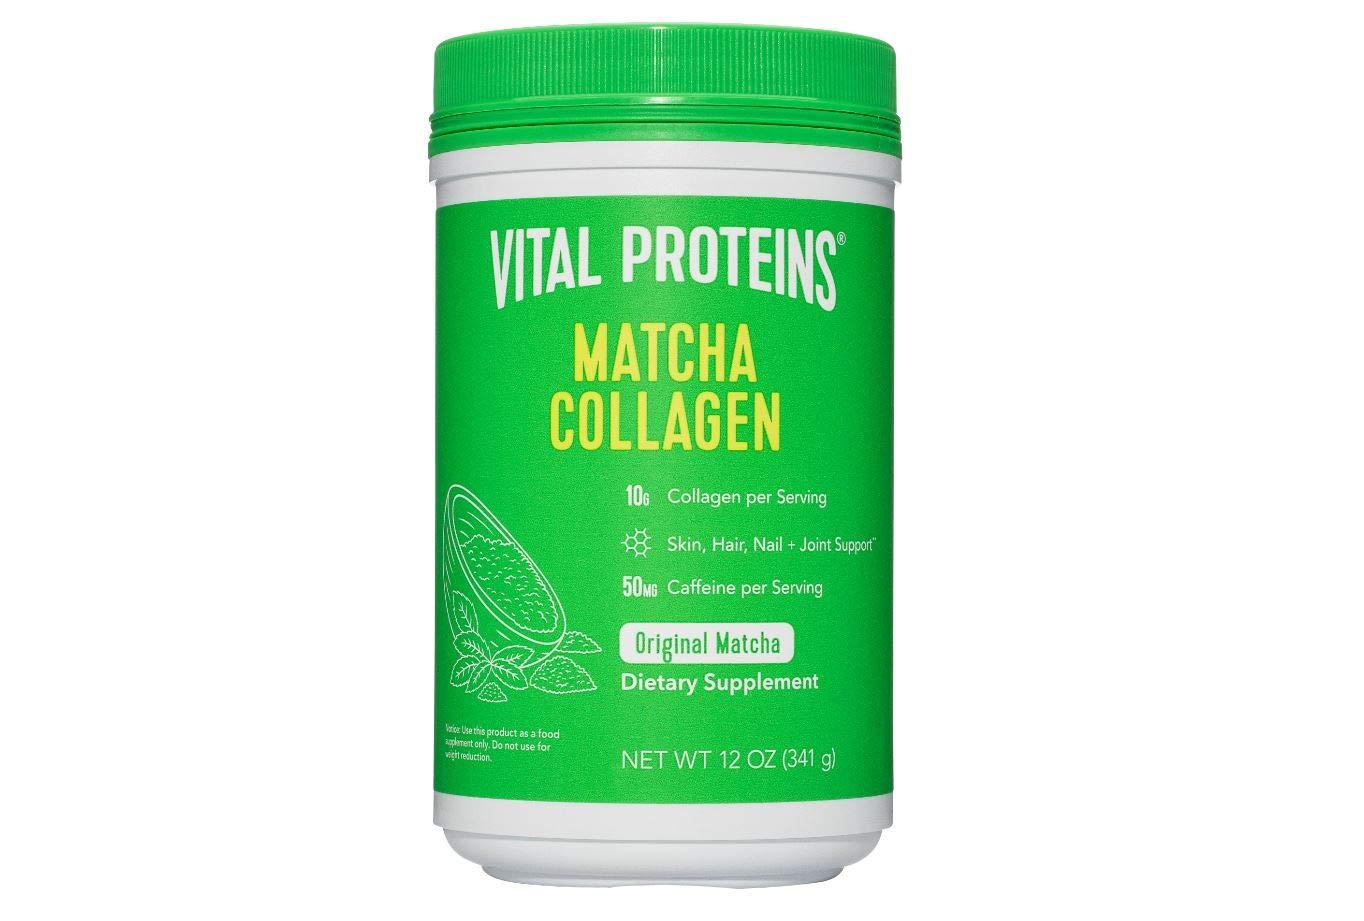 Vital Proteins Matcha Collagen - Matcha Green tea powder